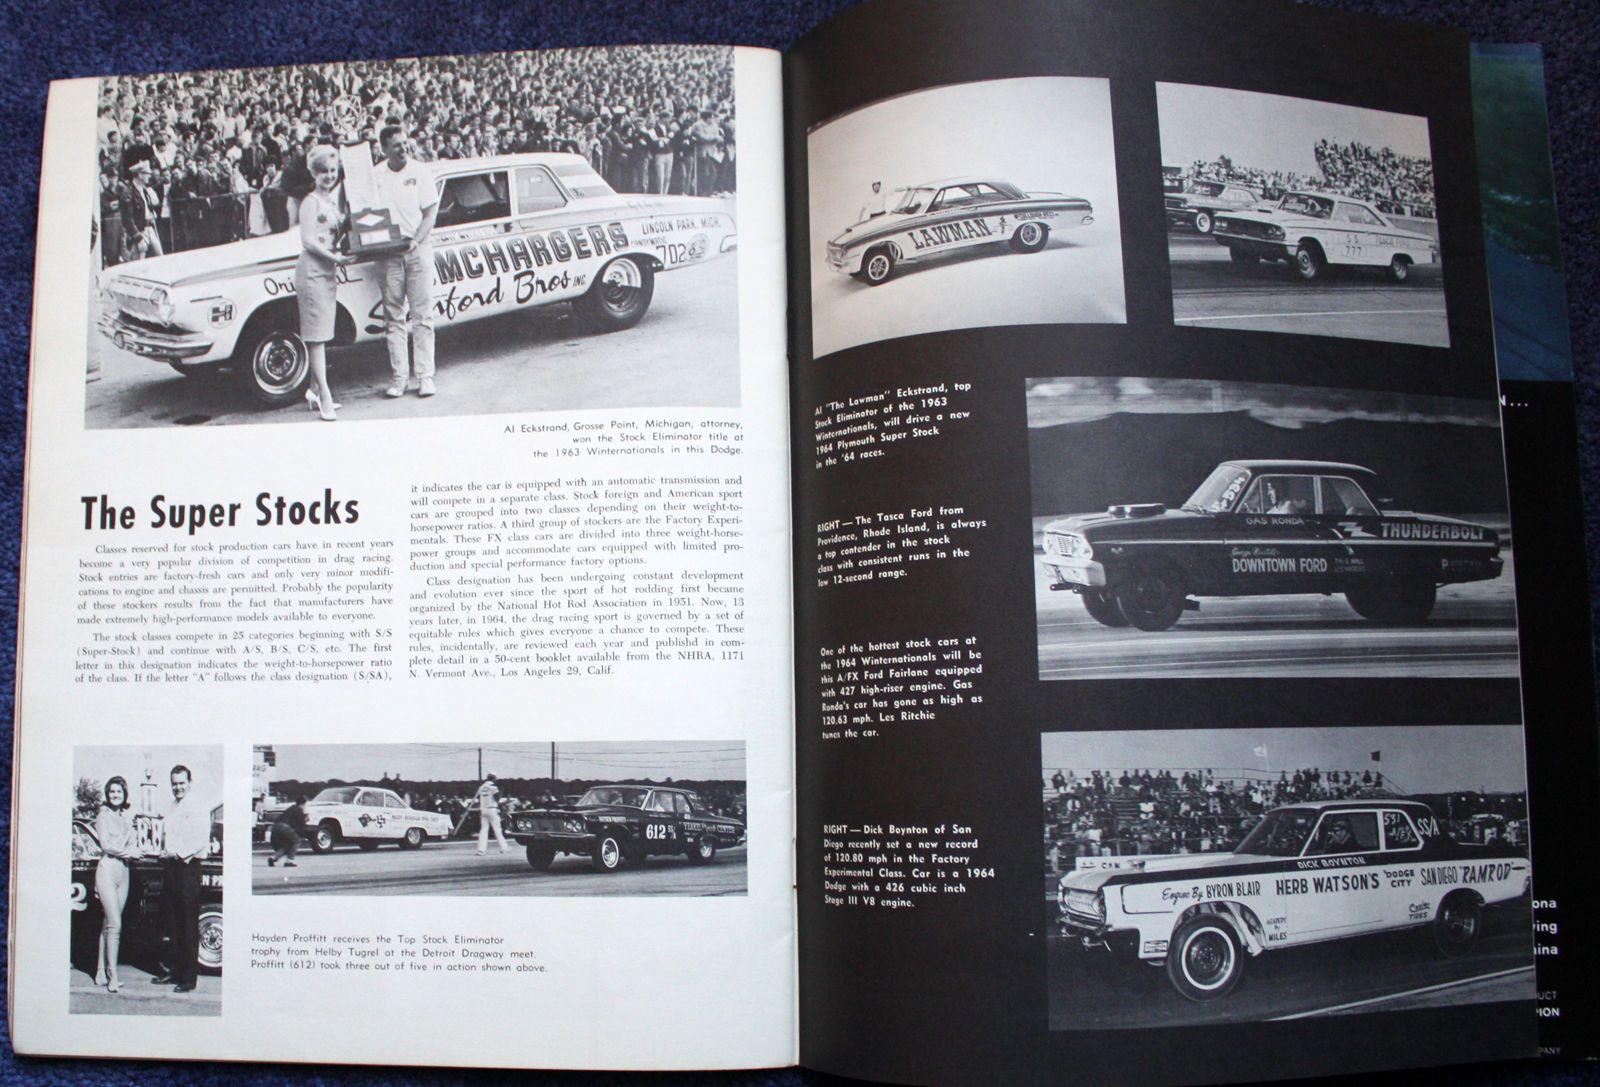 1964 NHRA Winternationals Drag Race Custom Car Show Program Entry List | eBay